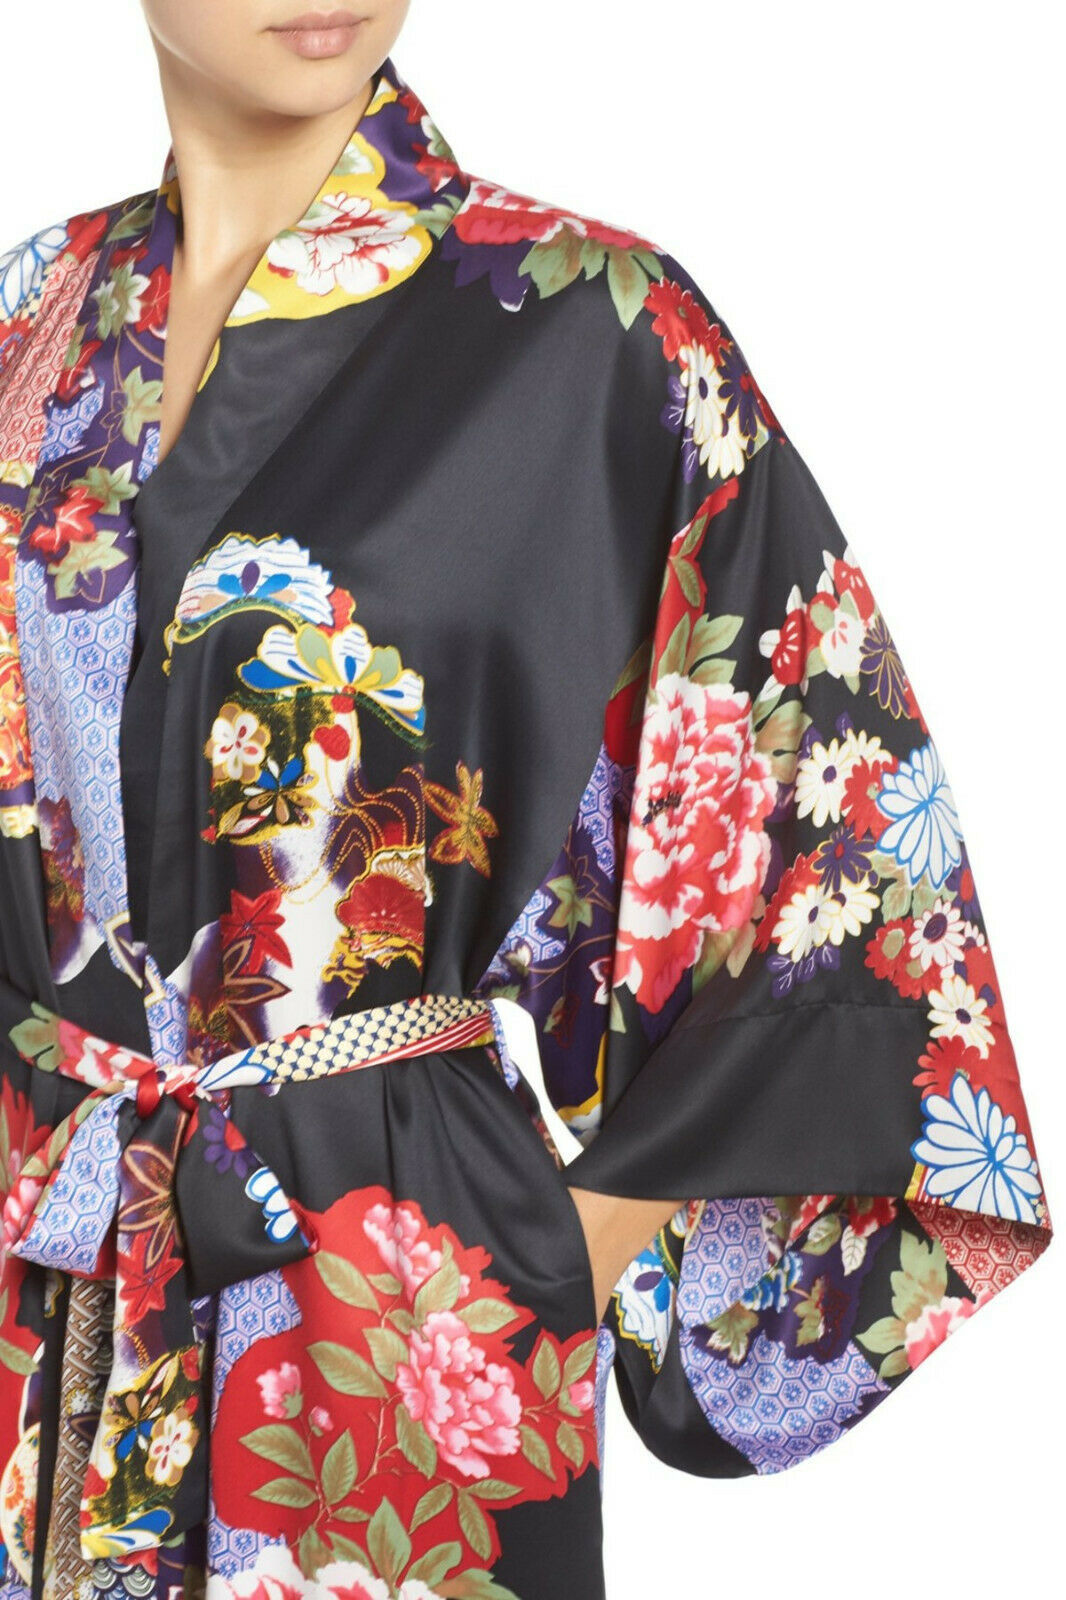 NWT New Designer Natori Wrap Robe Womens S Silky Satin Flowers Blue Red White image 3